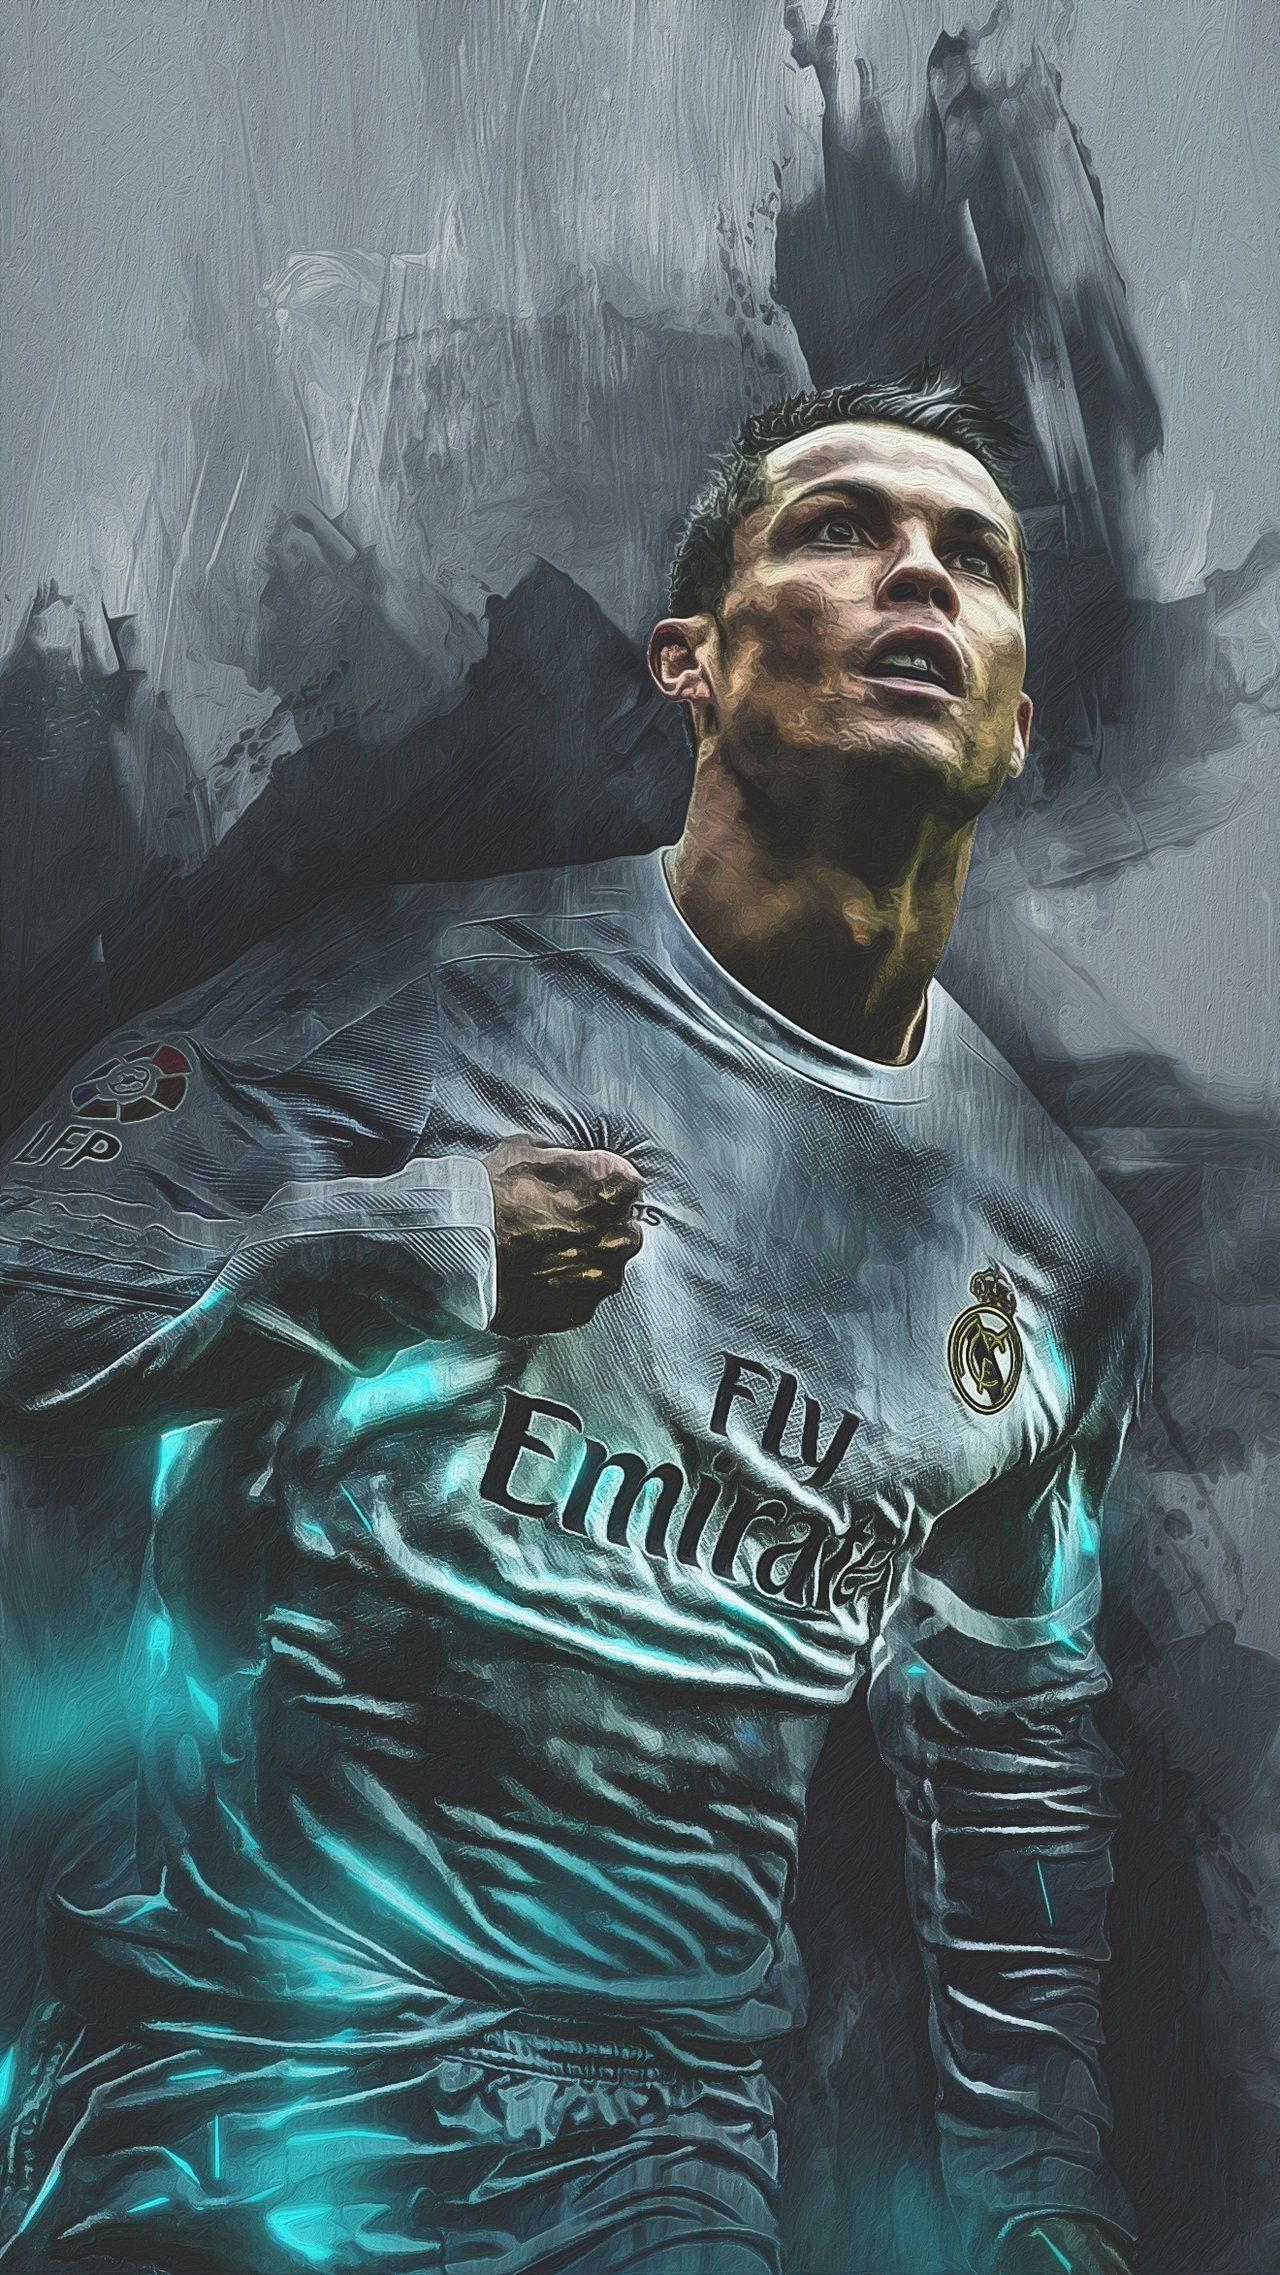 Cristiano Ronaldo Soccer 2016 Wallpapers - Wallpaper Cave